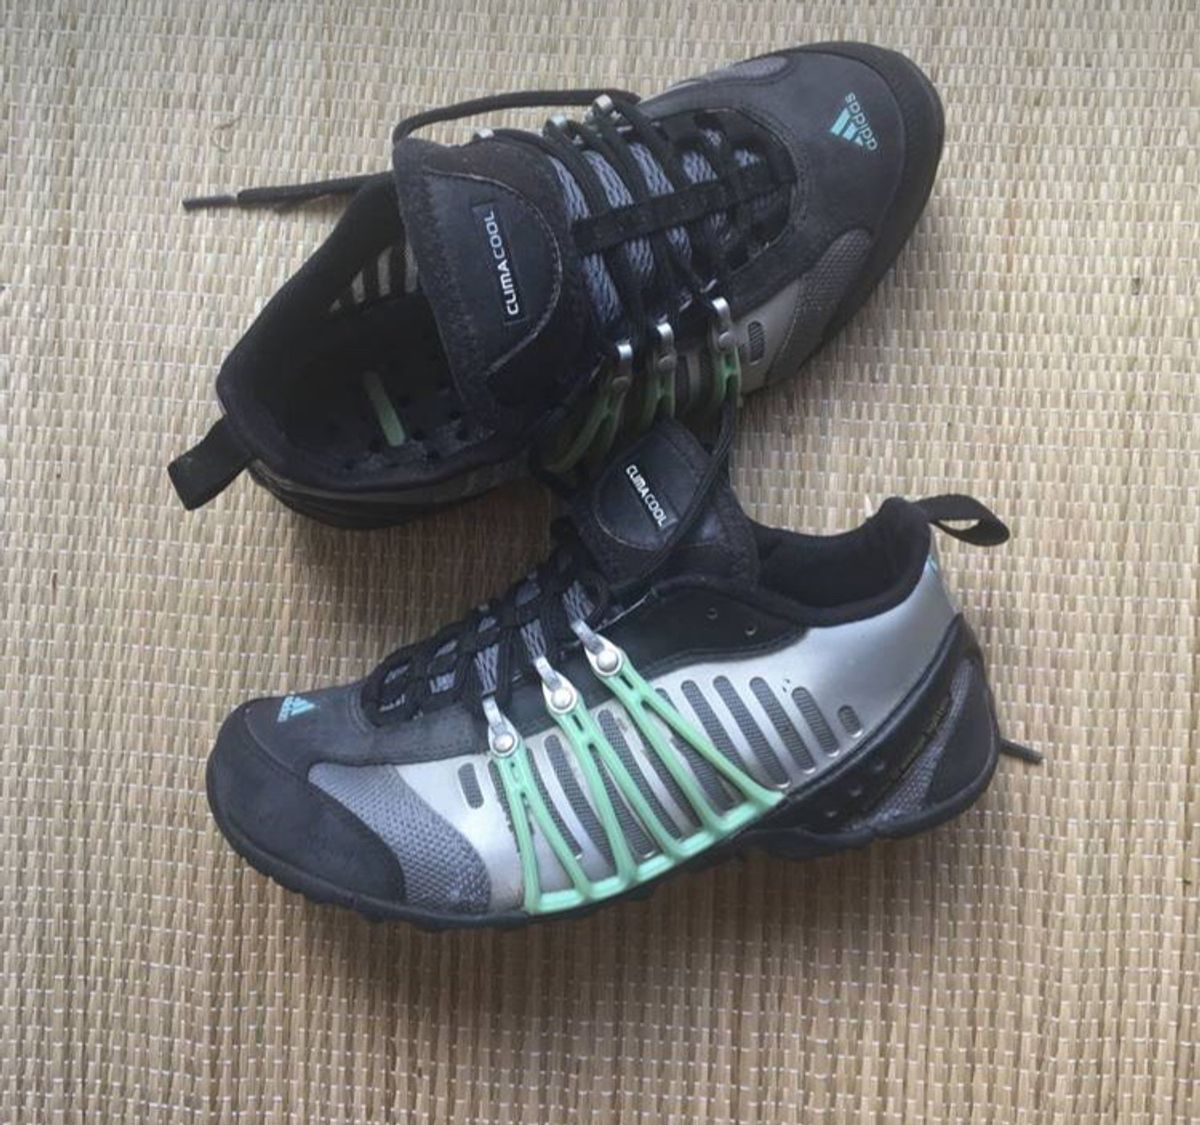 d705eefa10 sapato adidas aranha - tênis adidas clima cool.  Czm6ly9wag90b3muzw5qb2vplmnvbs5ici9wcm9kdwn0cy81mdq0nzyylzc0ntvkntg0mju2n2ewzgrlnzzkzdu5ntezzdiyzjljlmpwzw